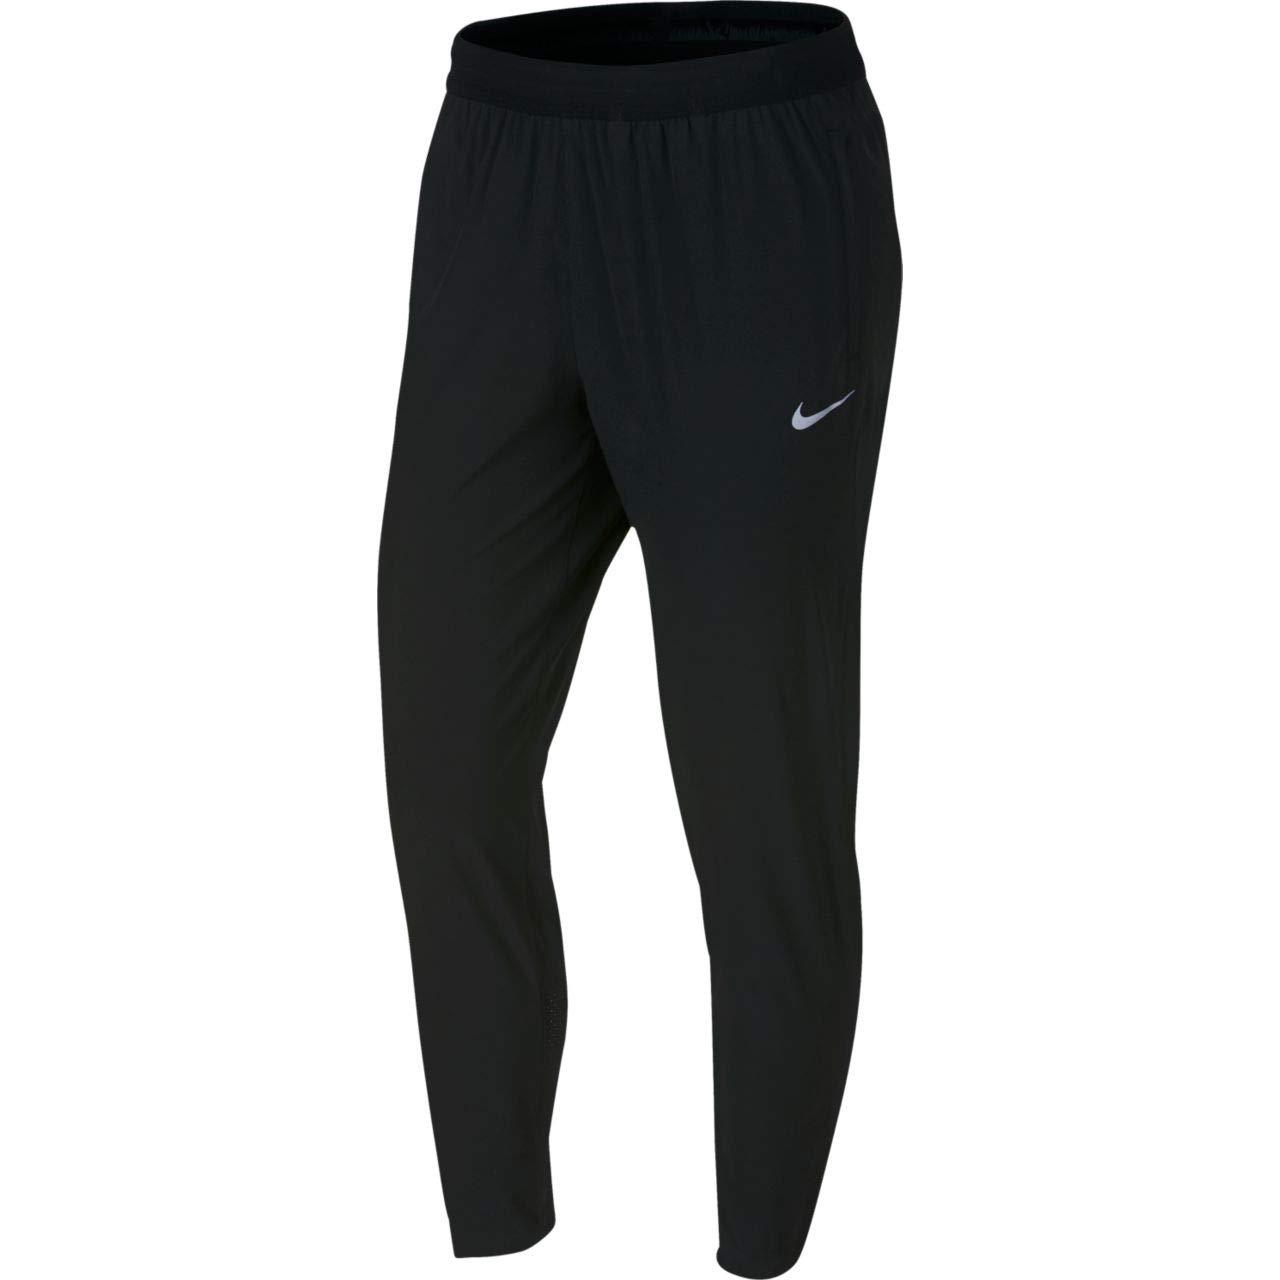 NIKE Women's Essential 7/8 Running Pants(Black, X-Large)